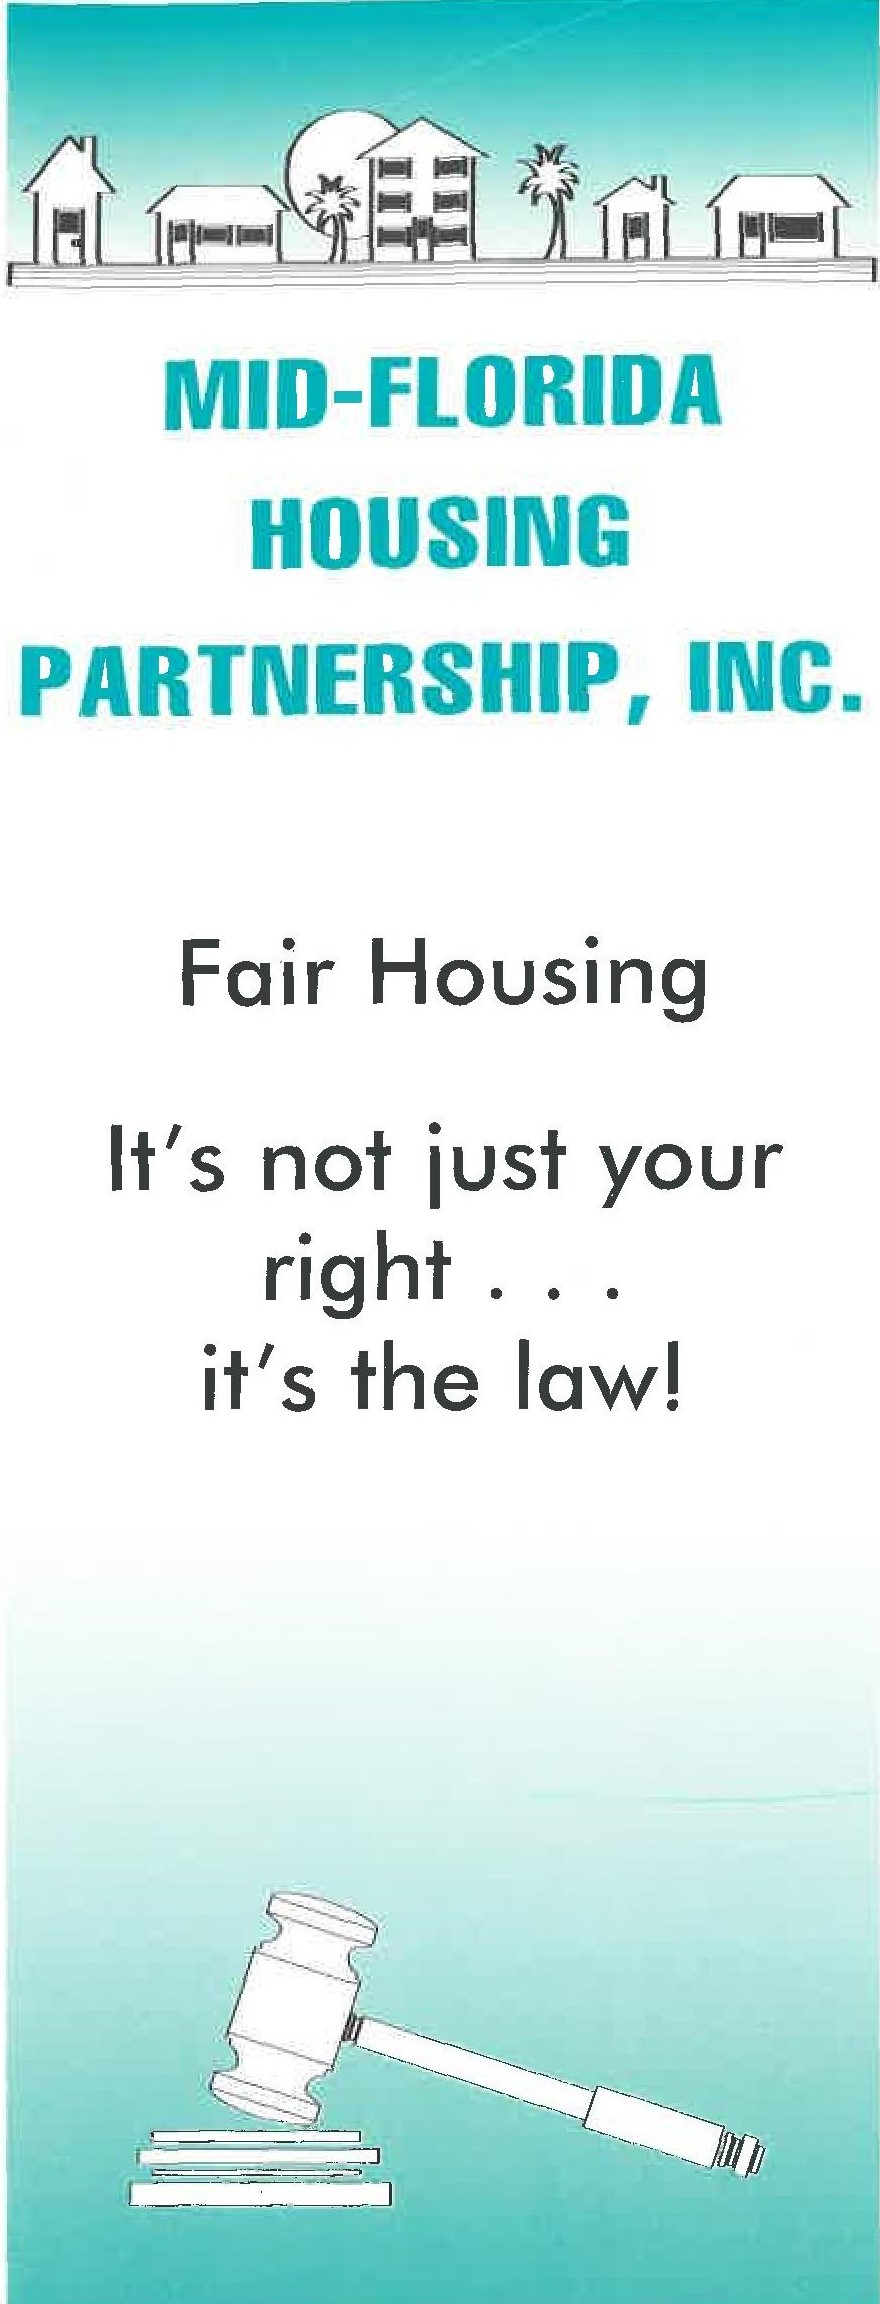 Fair Housing It's The Law